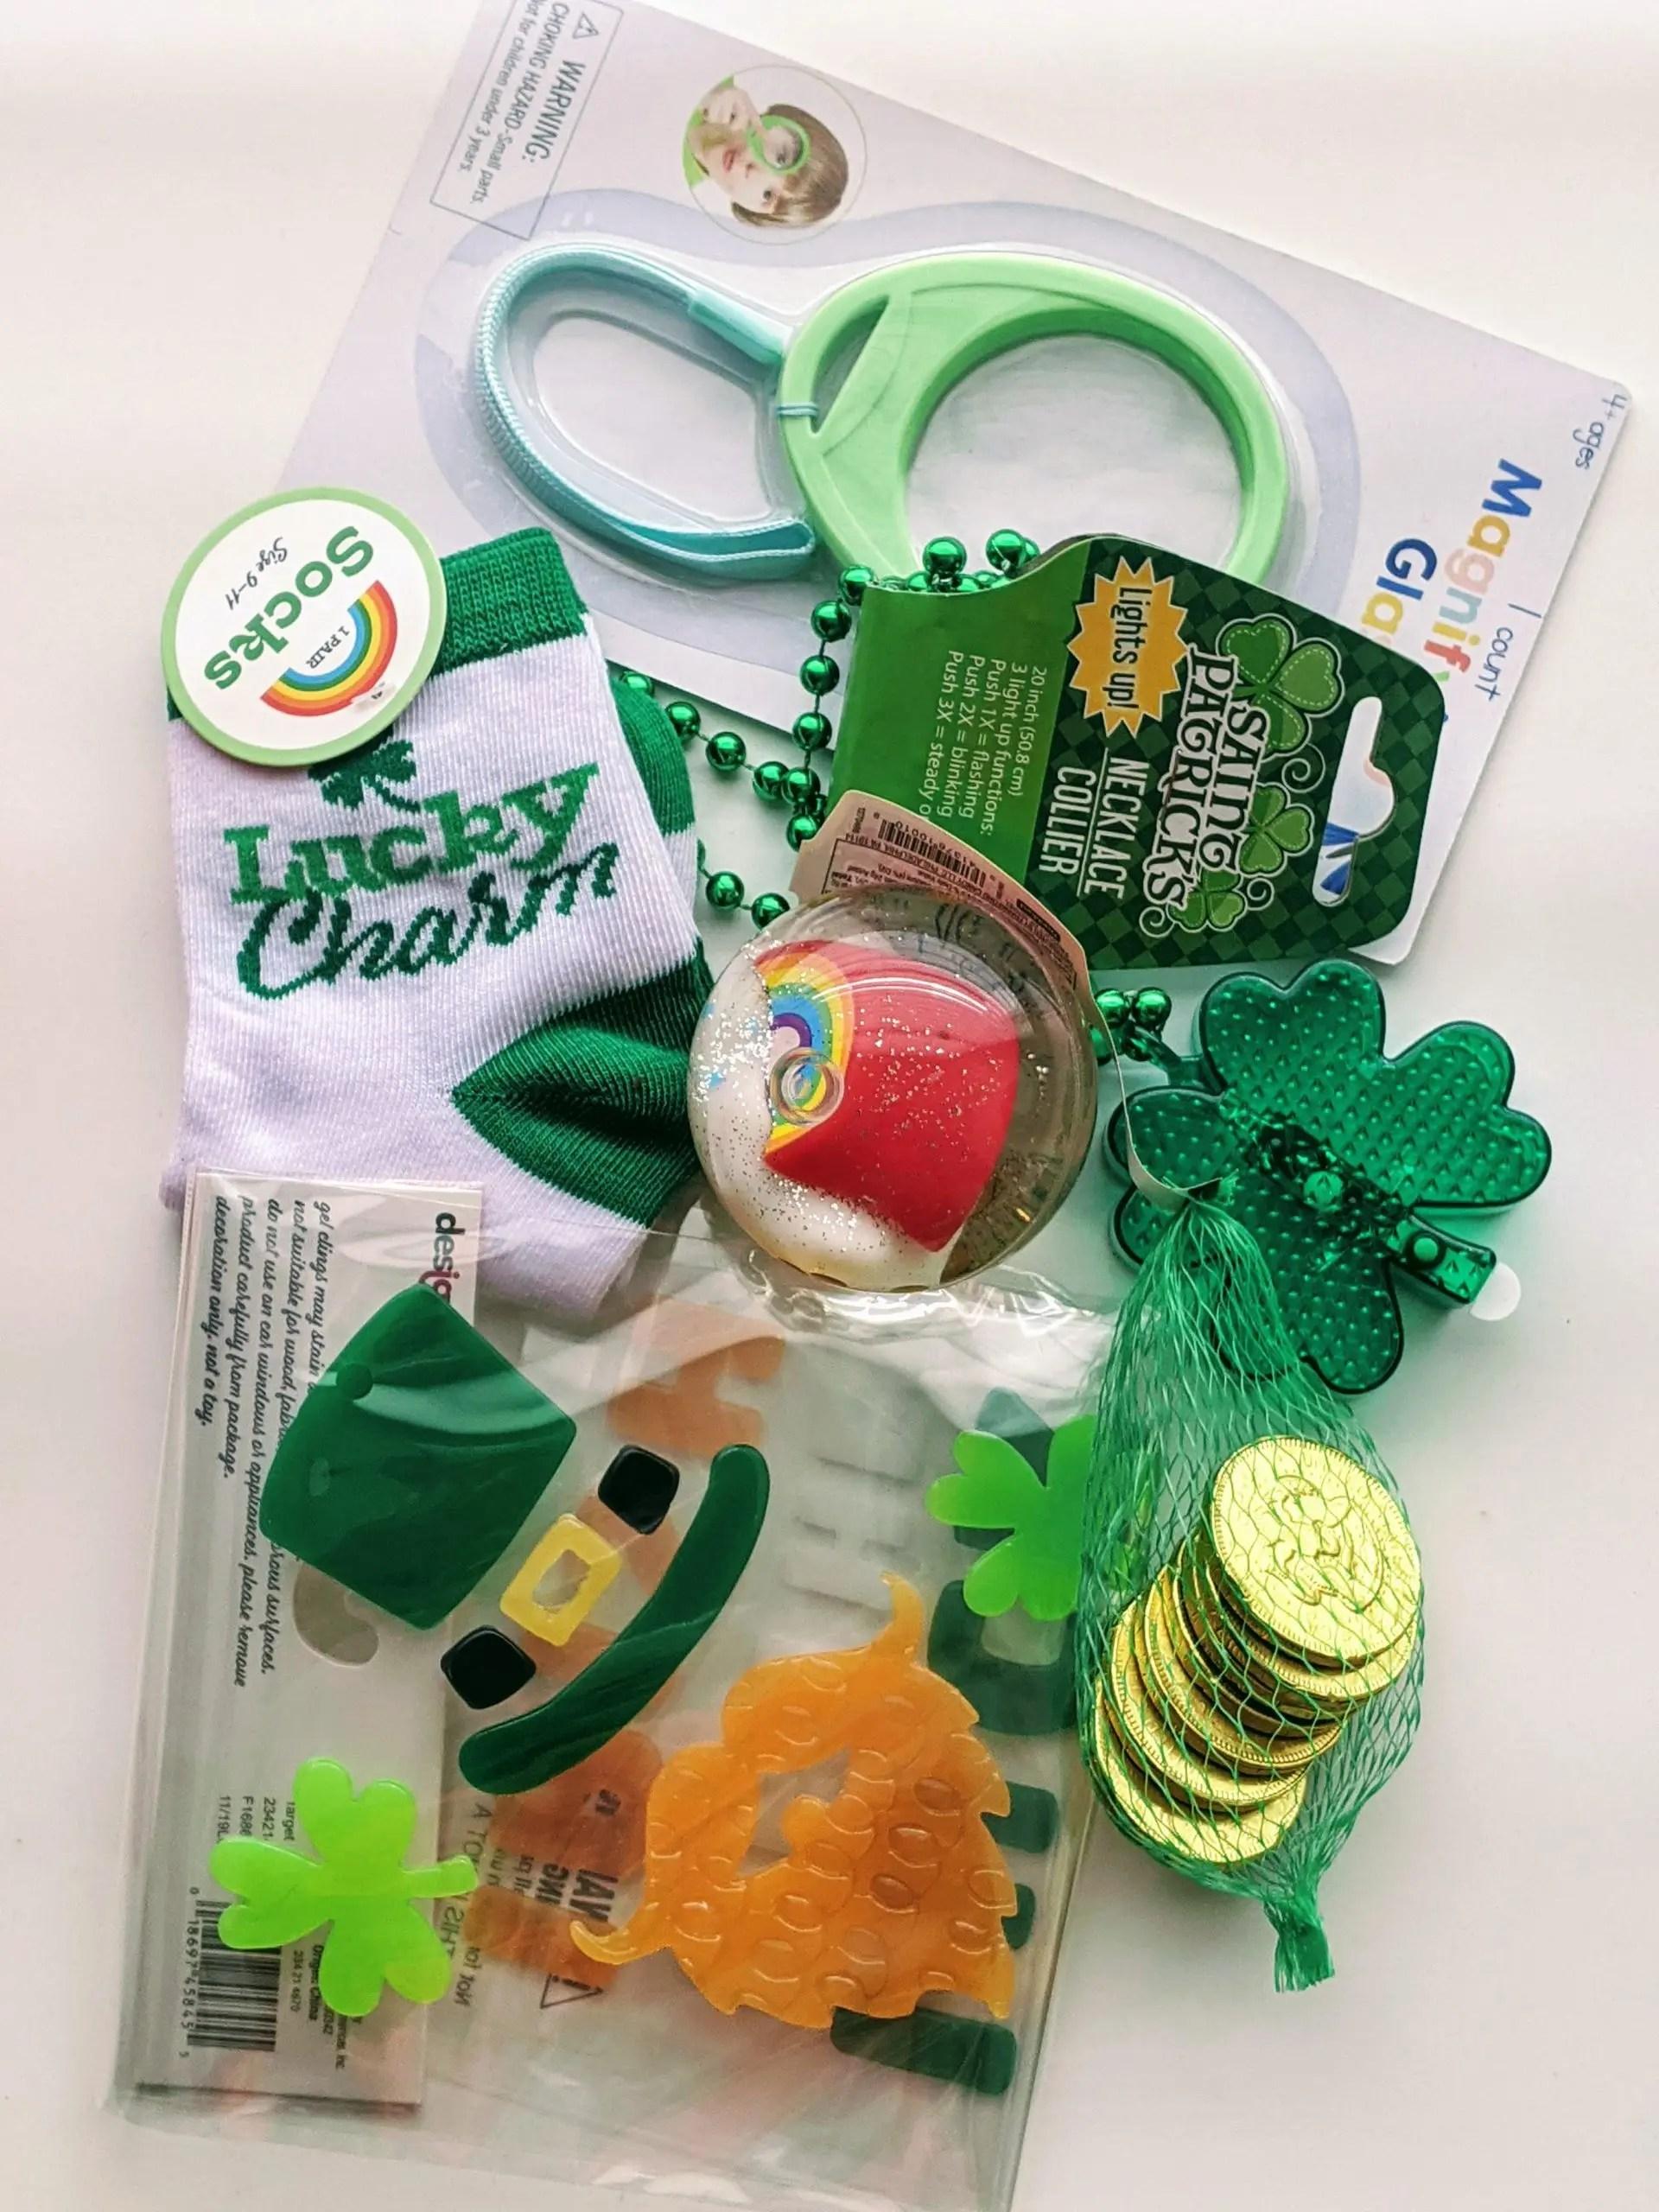 items for leprechaun trap